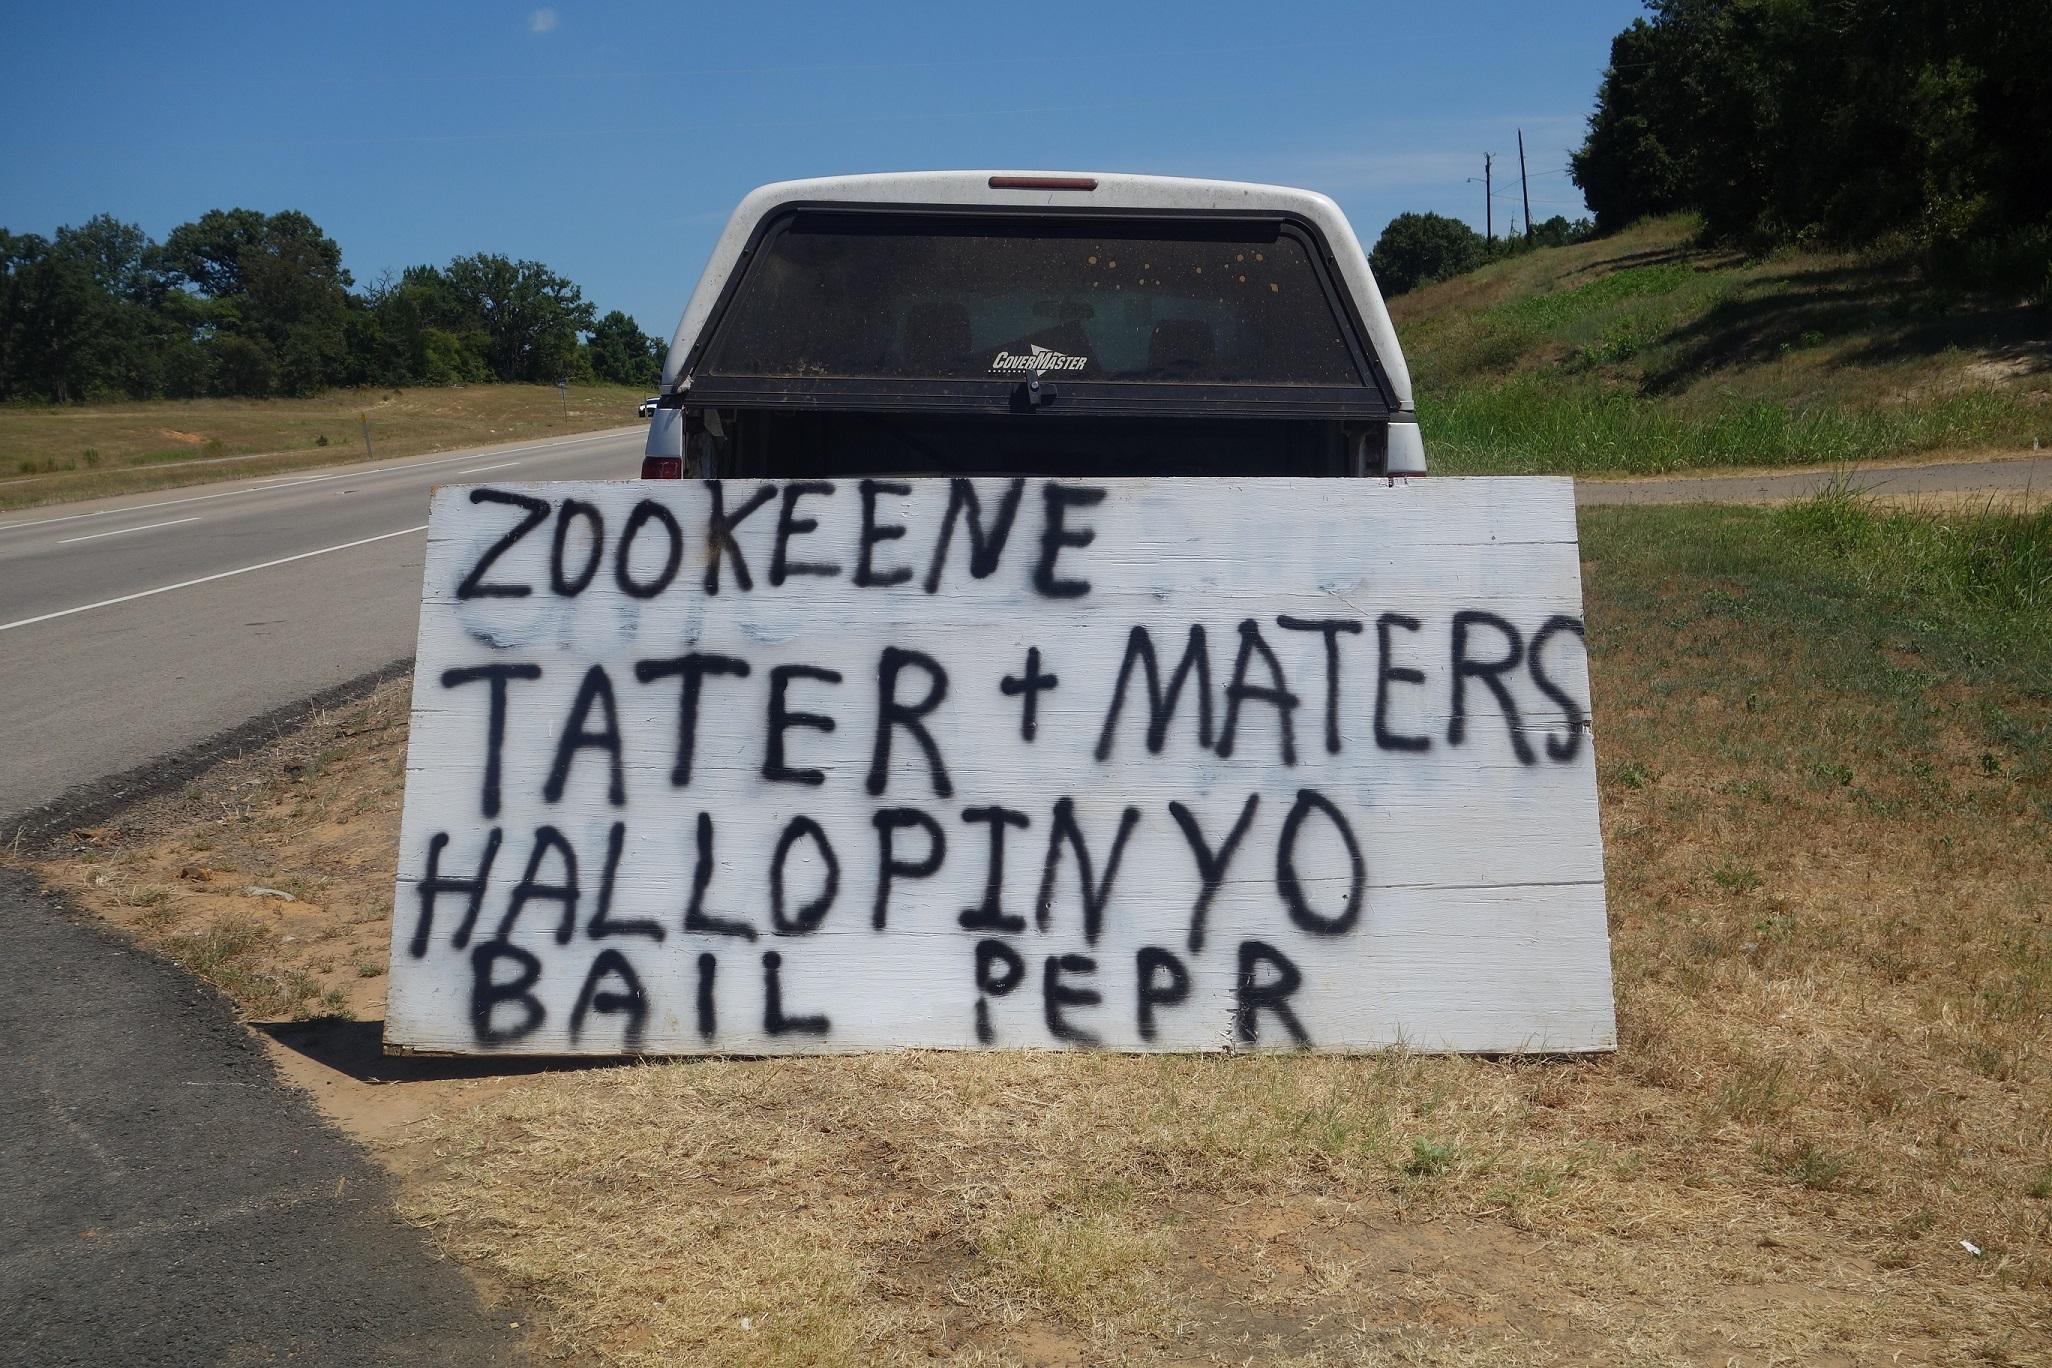 A quality roadside food stand.